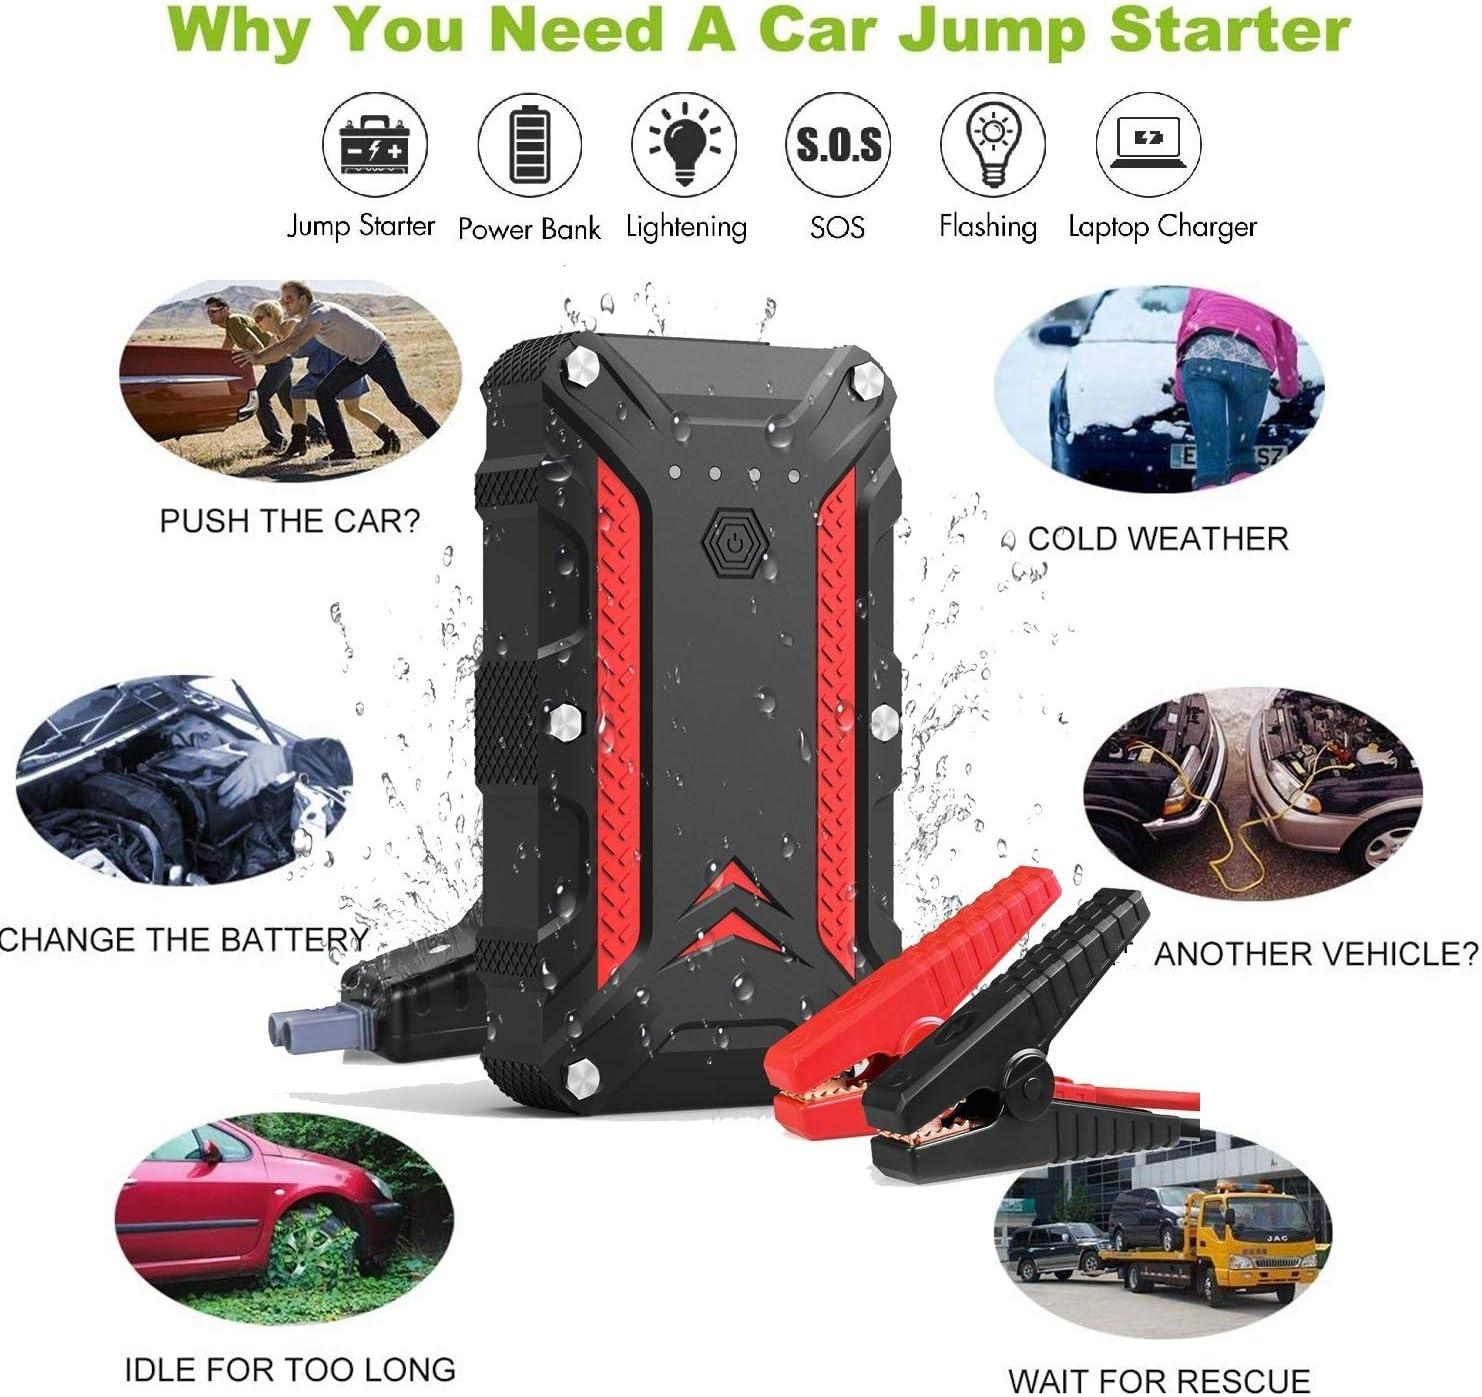 YORKING Auto Starthilfe Jump Starter Ladeger/ät Starthilfe Booster Wasserdicht Starthilfe Powerbank f/ür Notfall Car Jump Starter